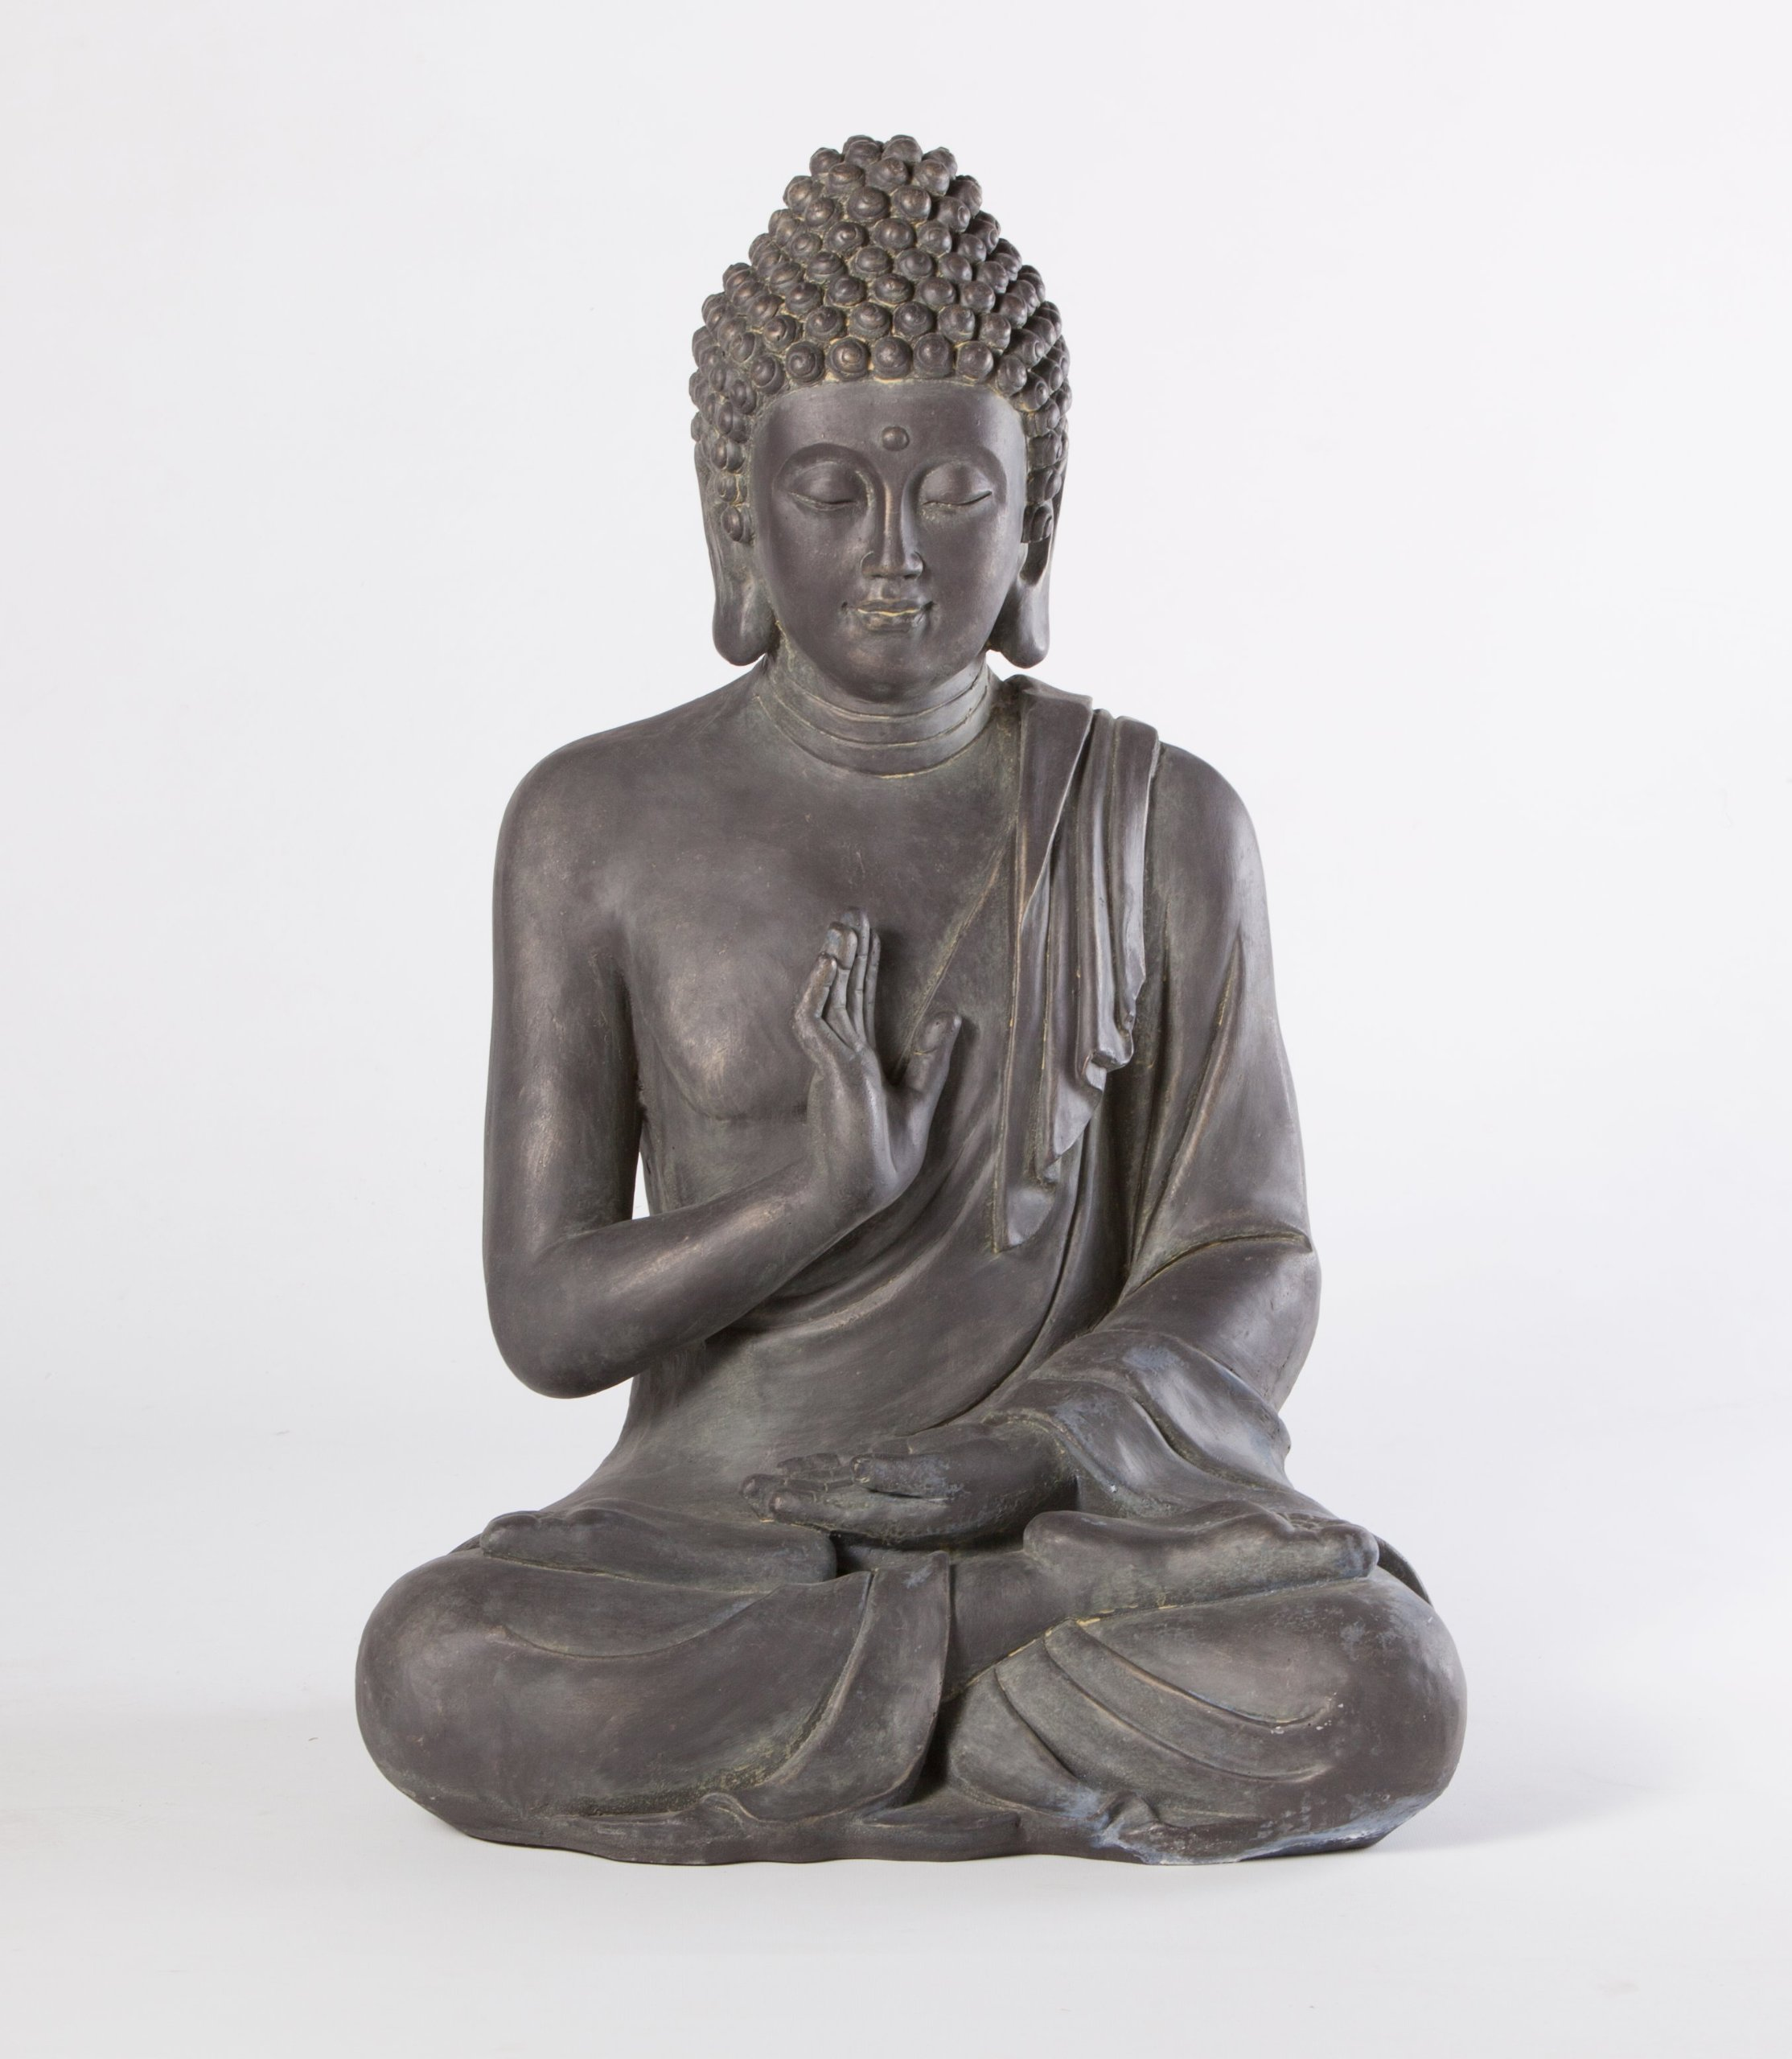 Alfresco Home Thai Buddha Garden Statue by Alfresco Home